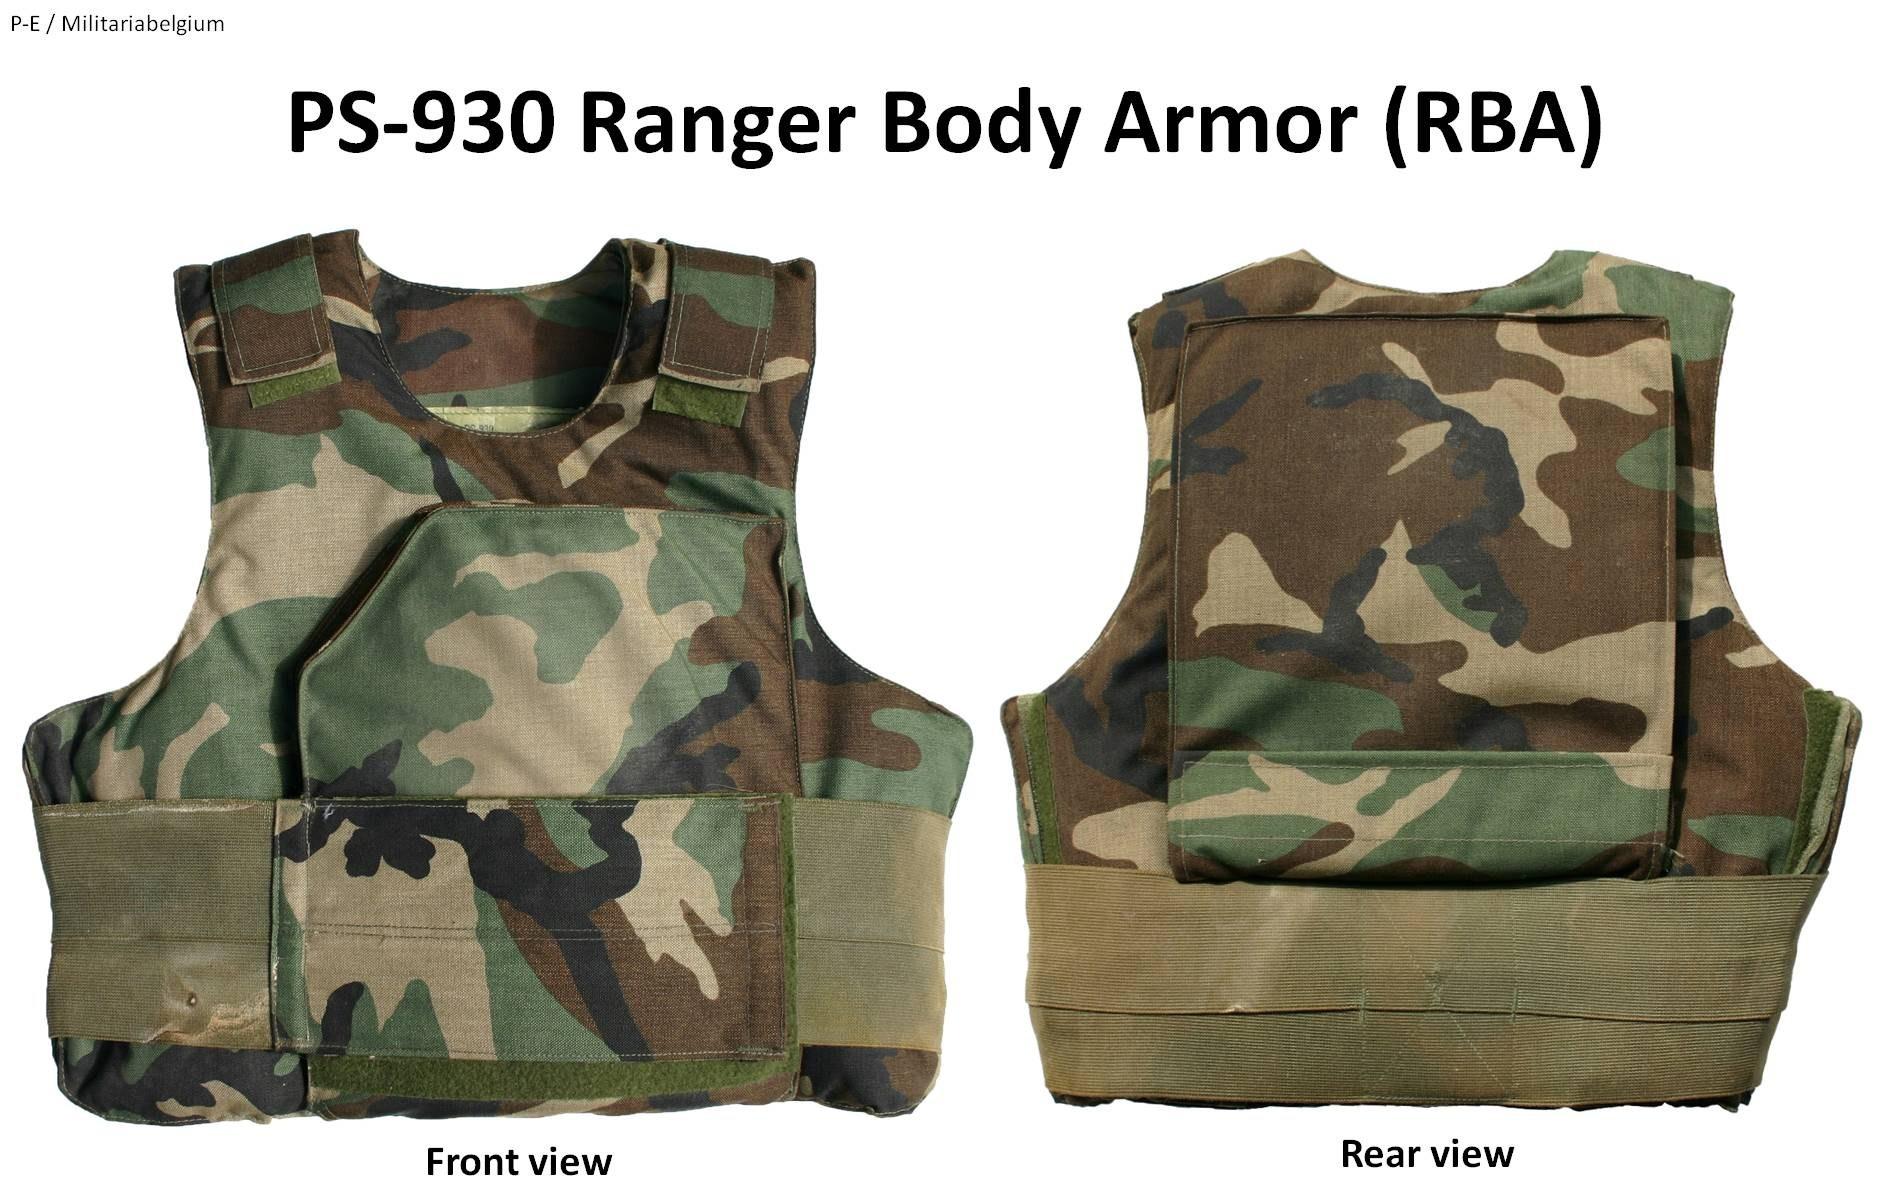 http://upload.wikimedia.org/wikipedia/commons/f/f7/Ranger_Body_Armor_%28PS-930%29.jpg